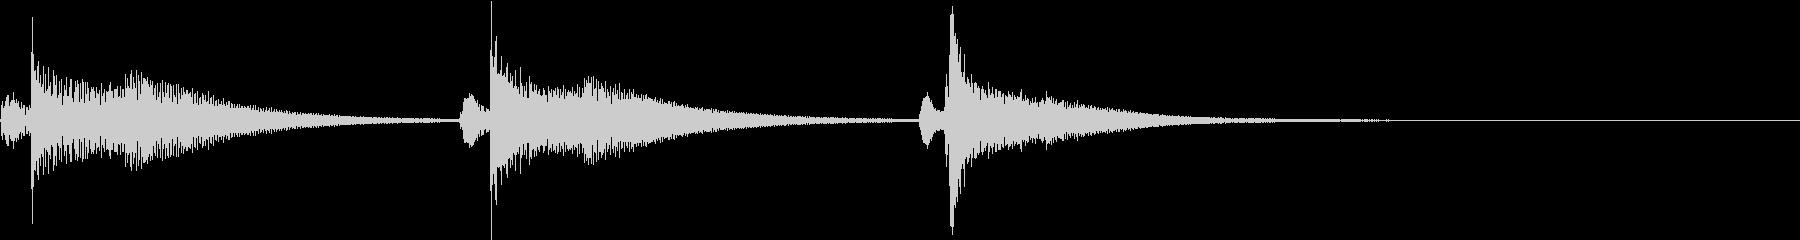 Kawaii メルヘンな受信・通知音 2の未再生の波形